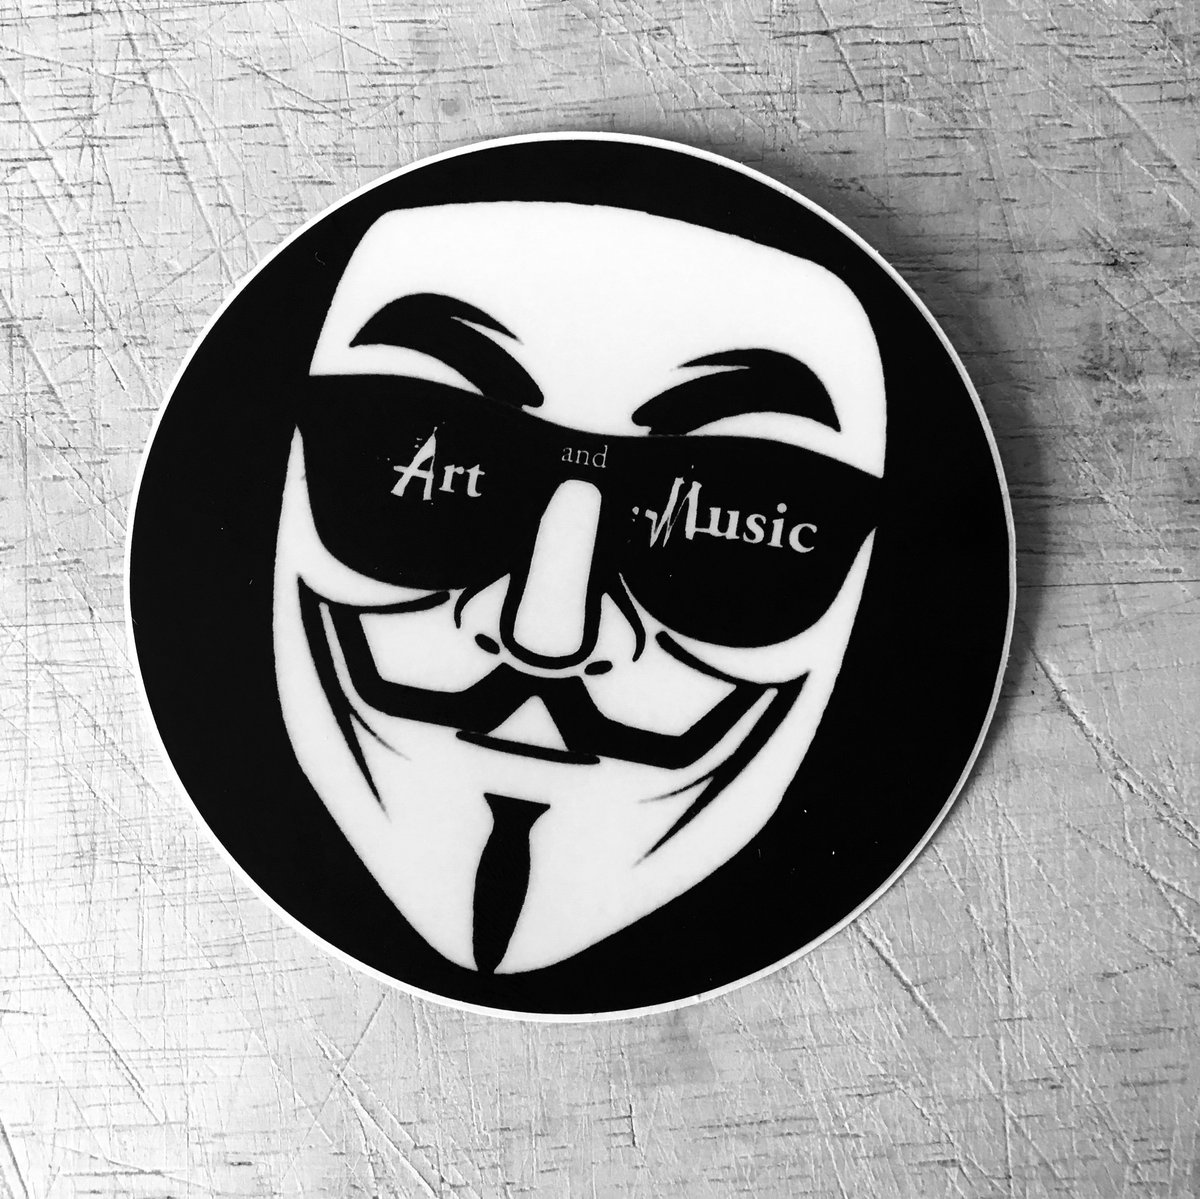 Art and Music_Sticker_GF